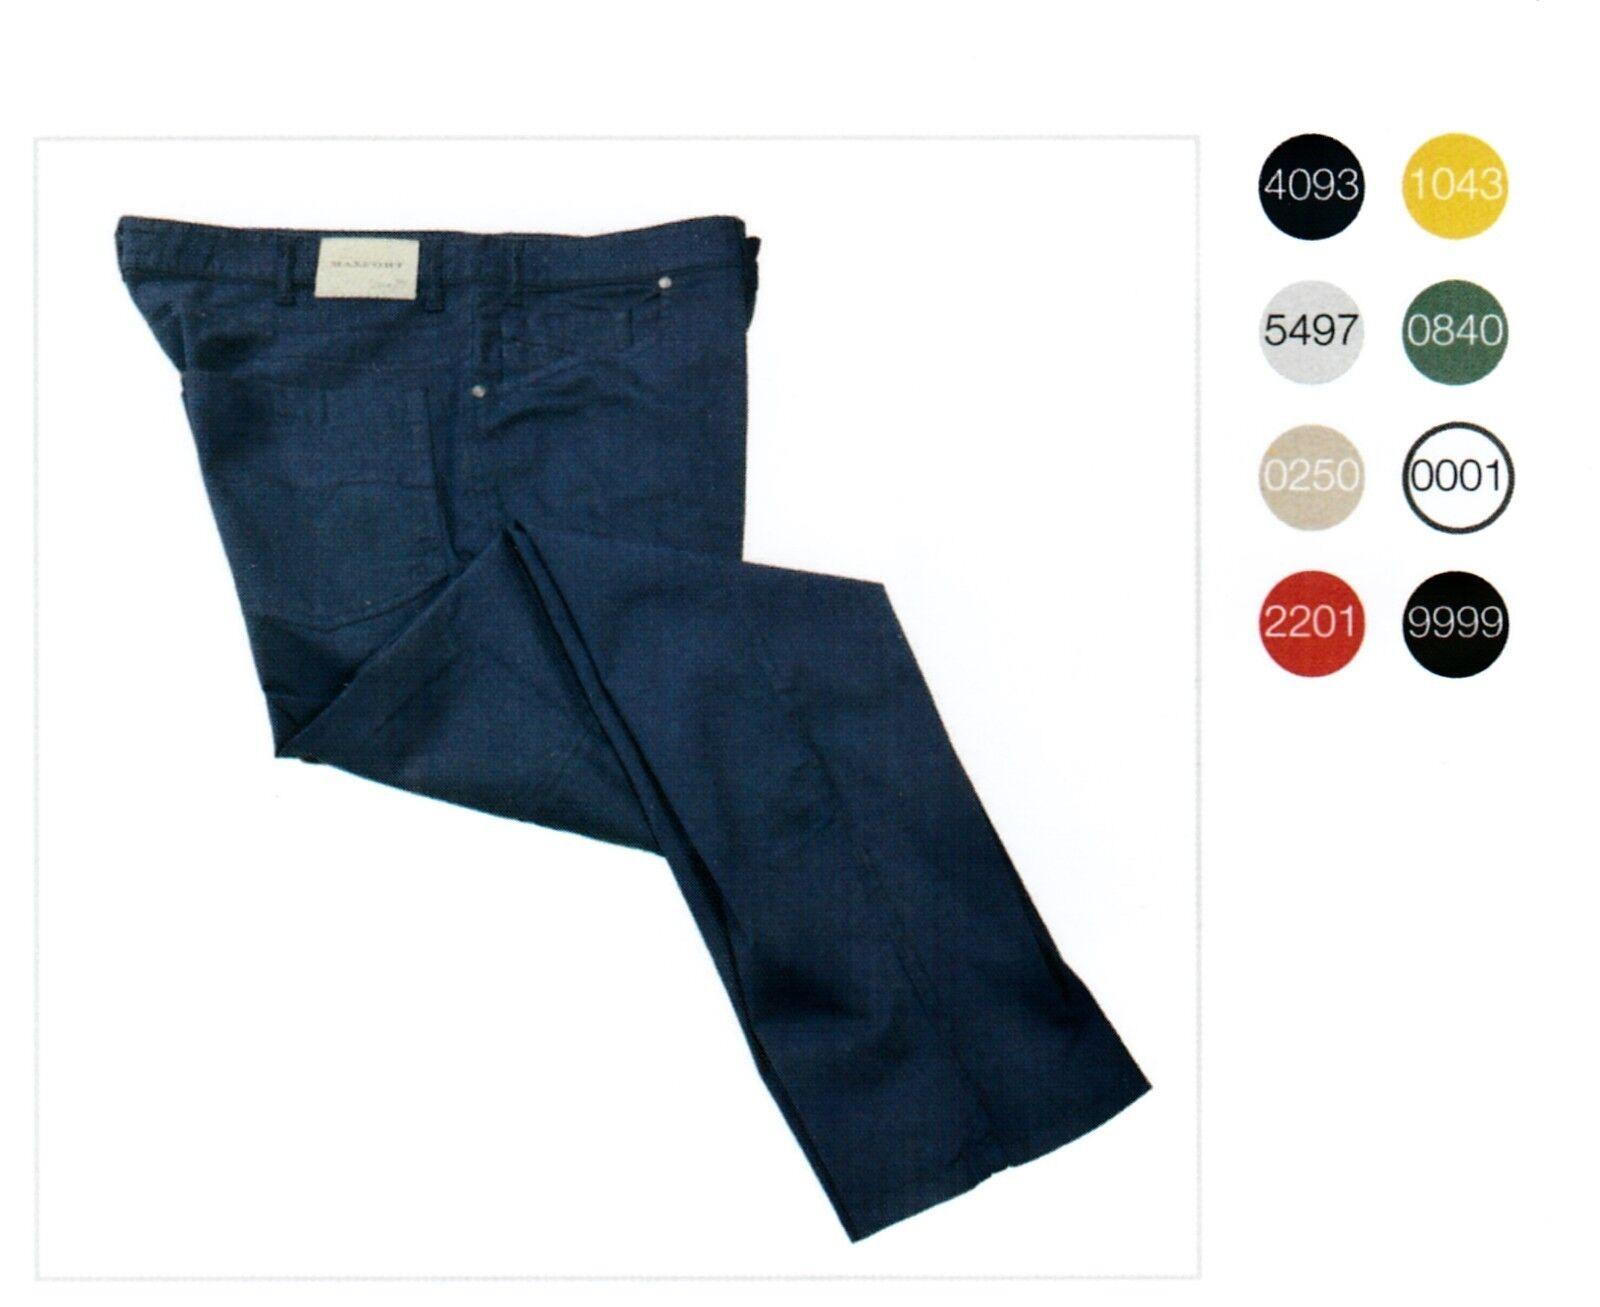 Maxfort gregorio pantalone uomo cotone taglie forti big Dimensione short pants jeans